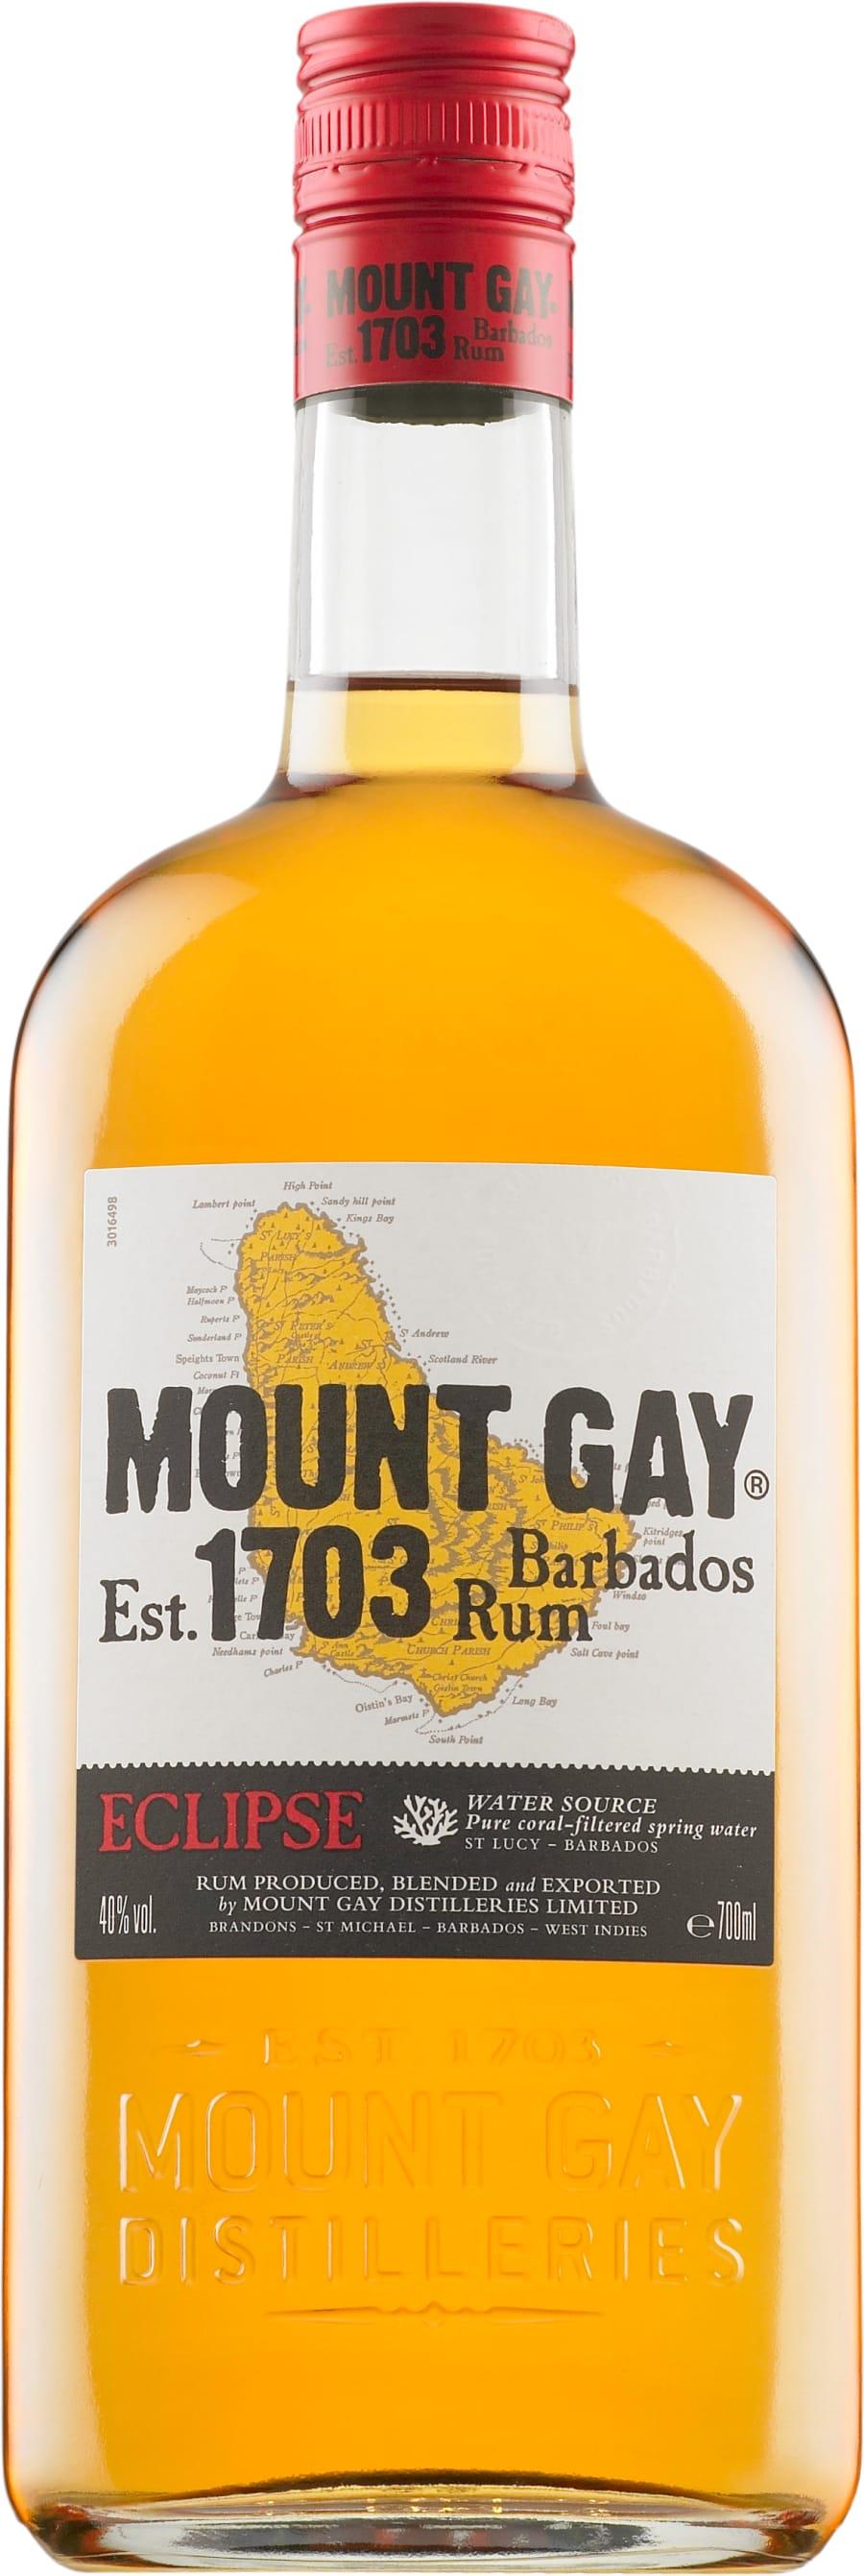 Gay dating sivustot Uusi-Seelanti